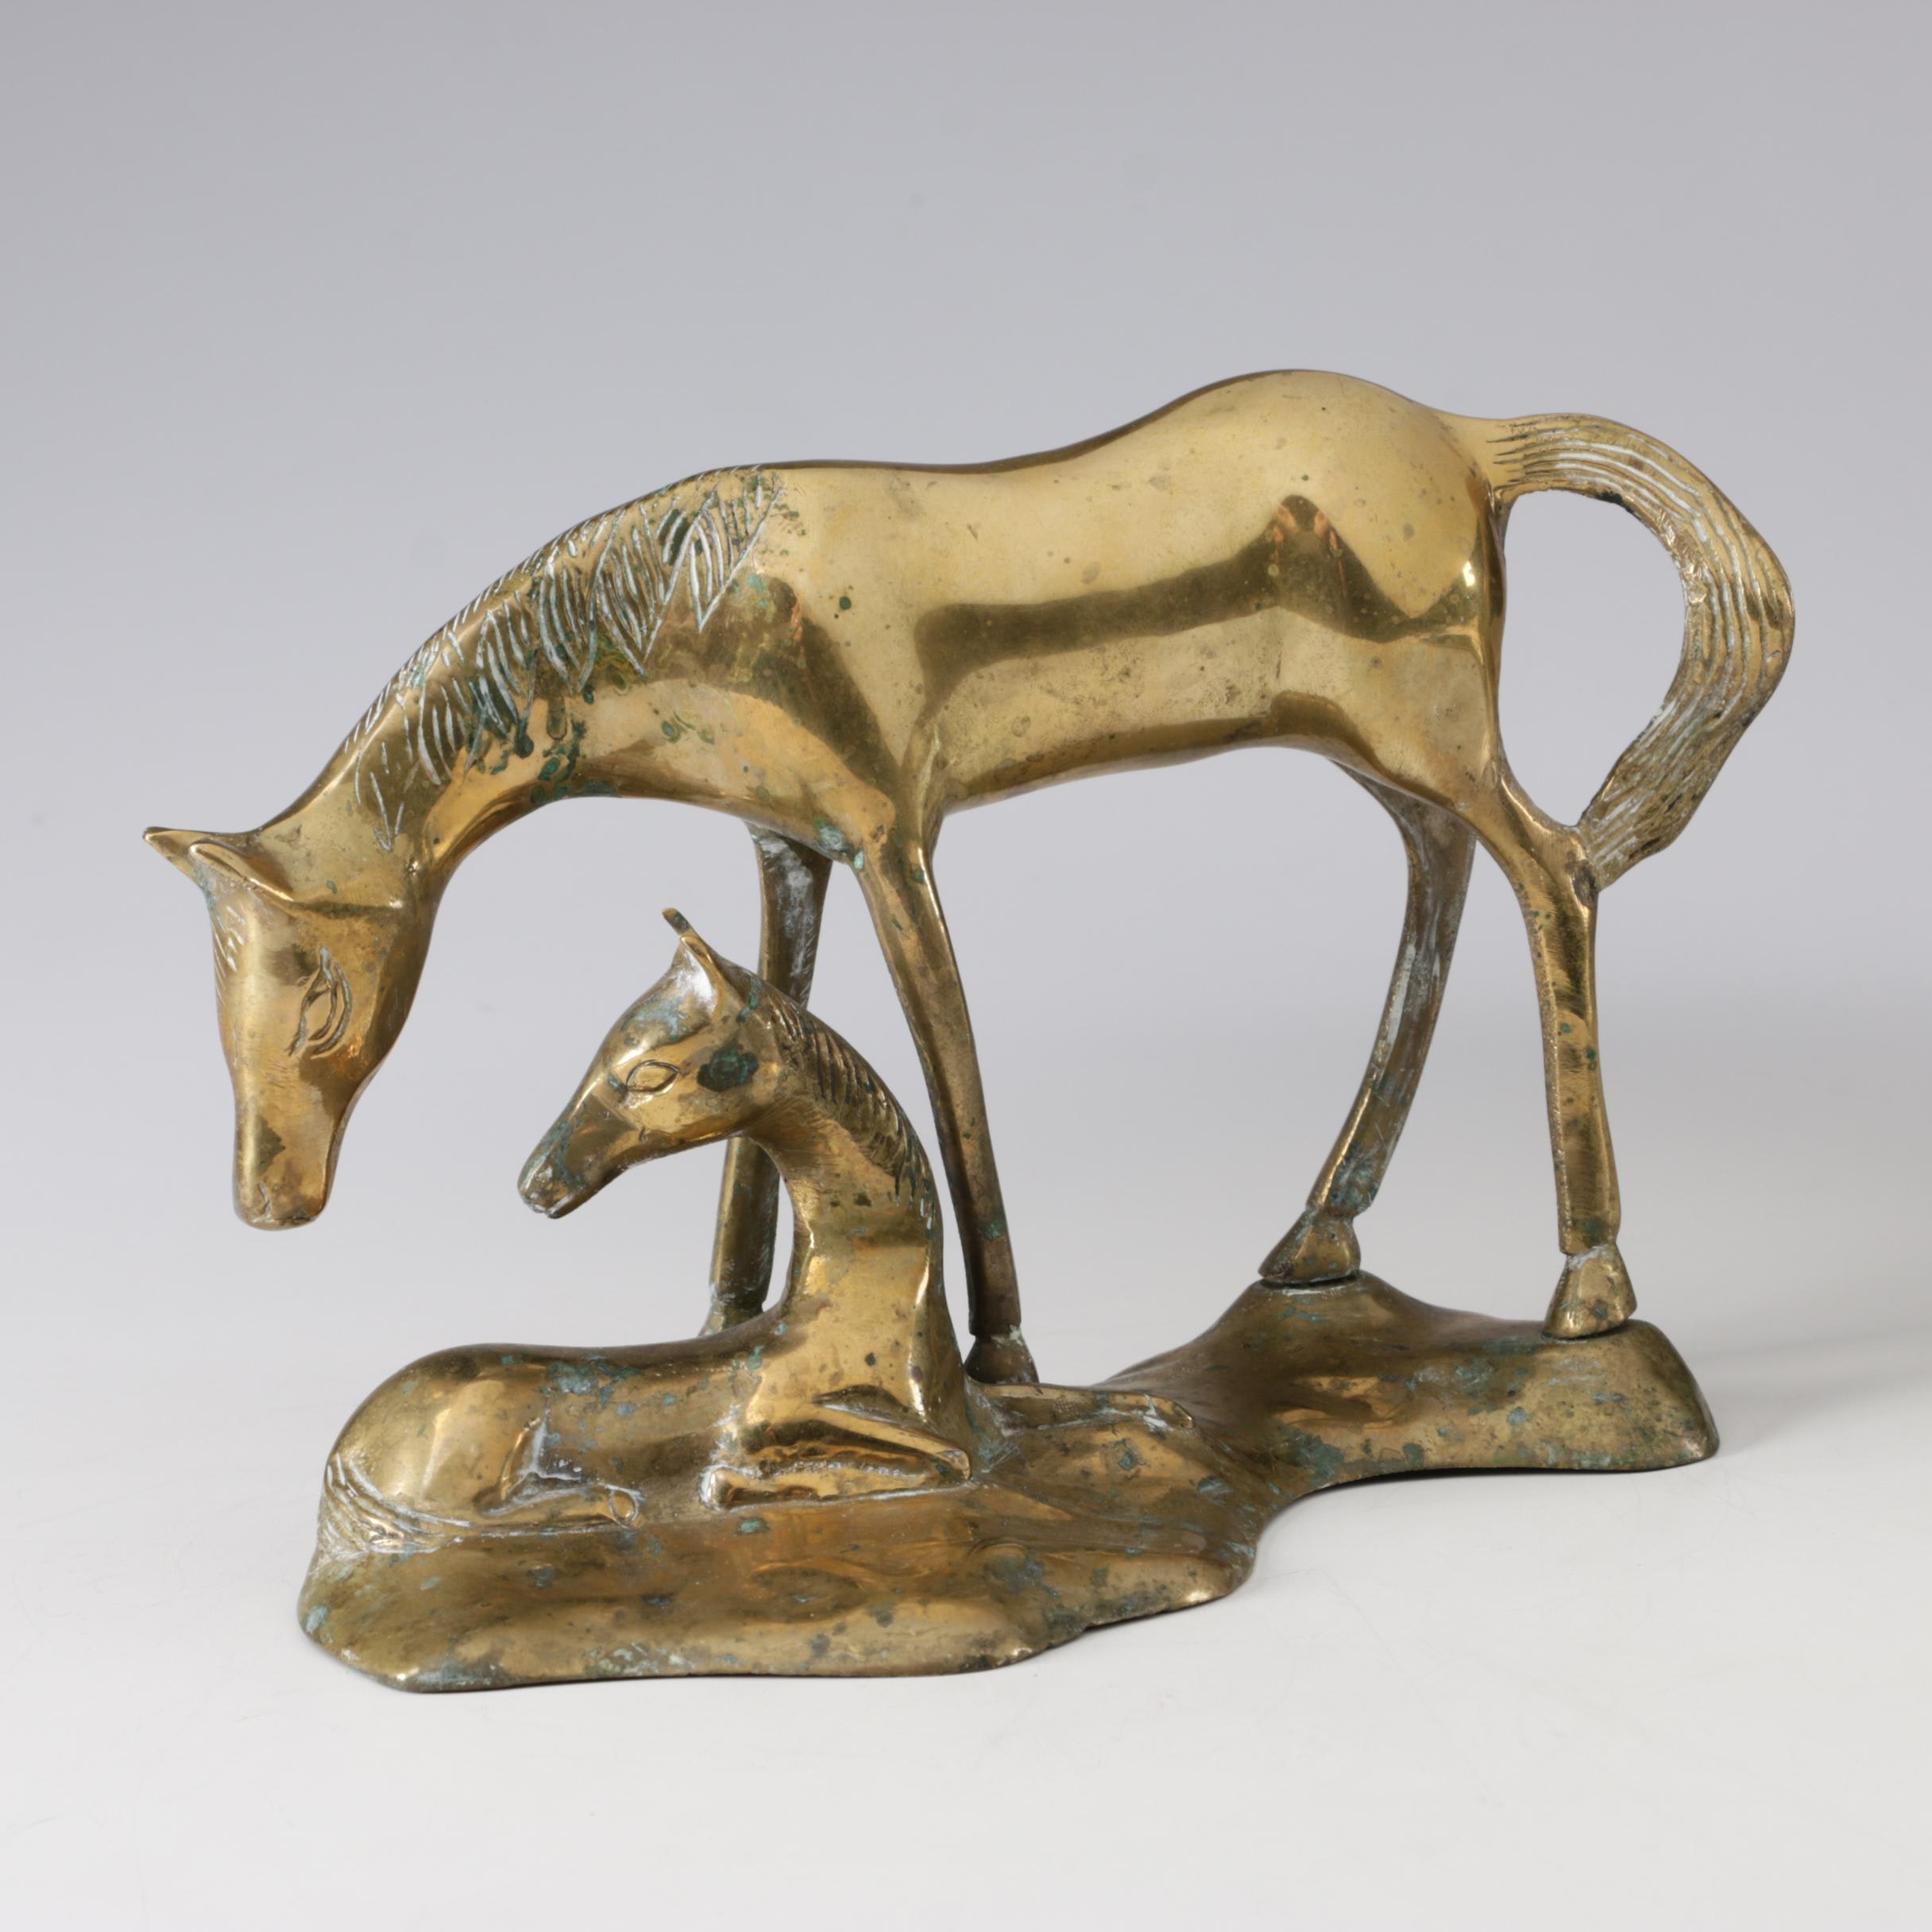 Cast Brass Mare and Foal Figurine, 1960s